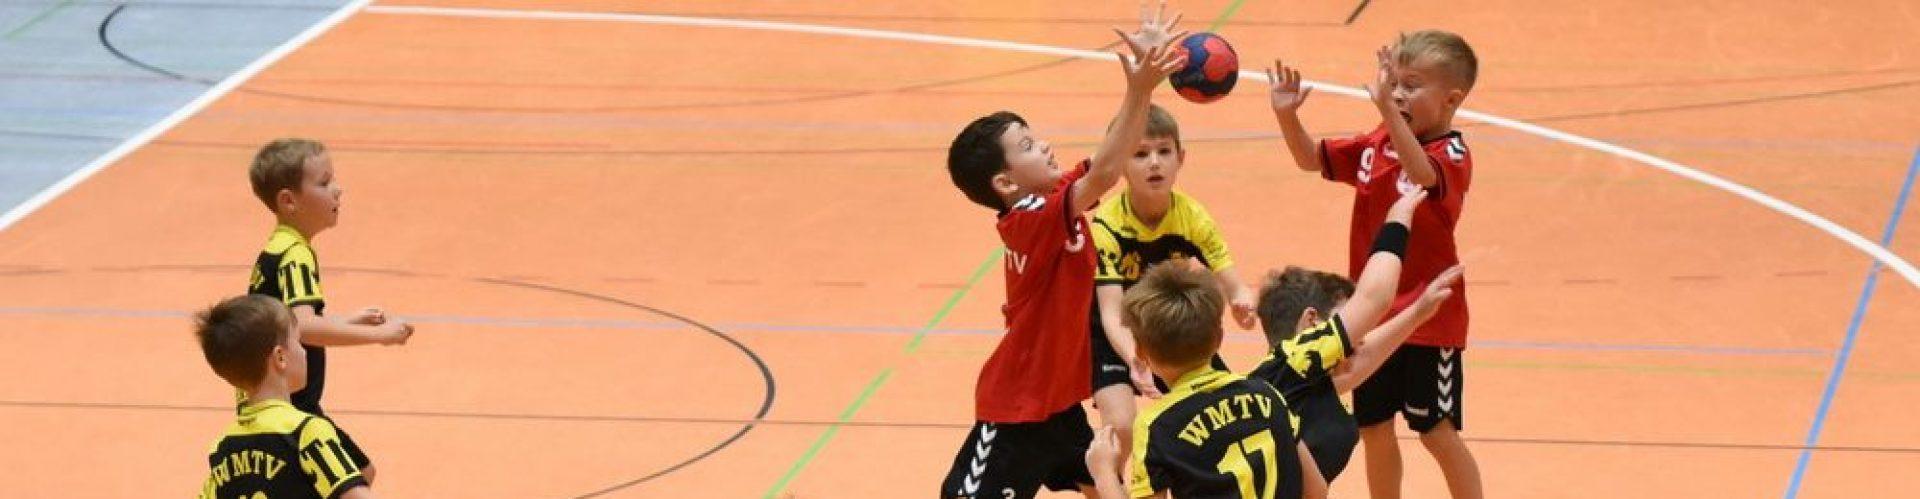 Haaner TV / HSG Adler Haan - Handball für Haan